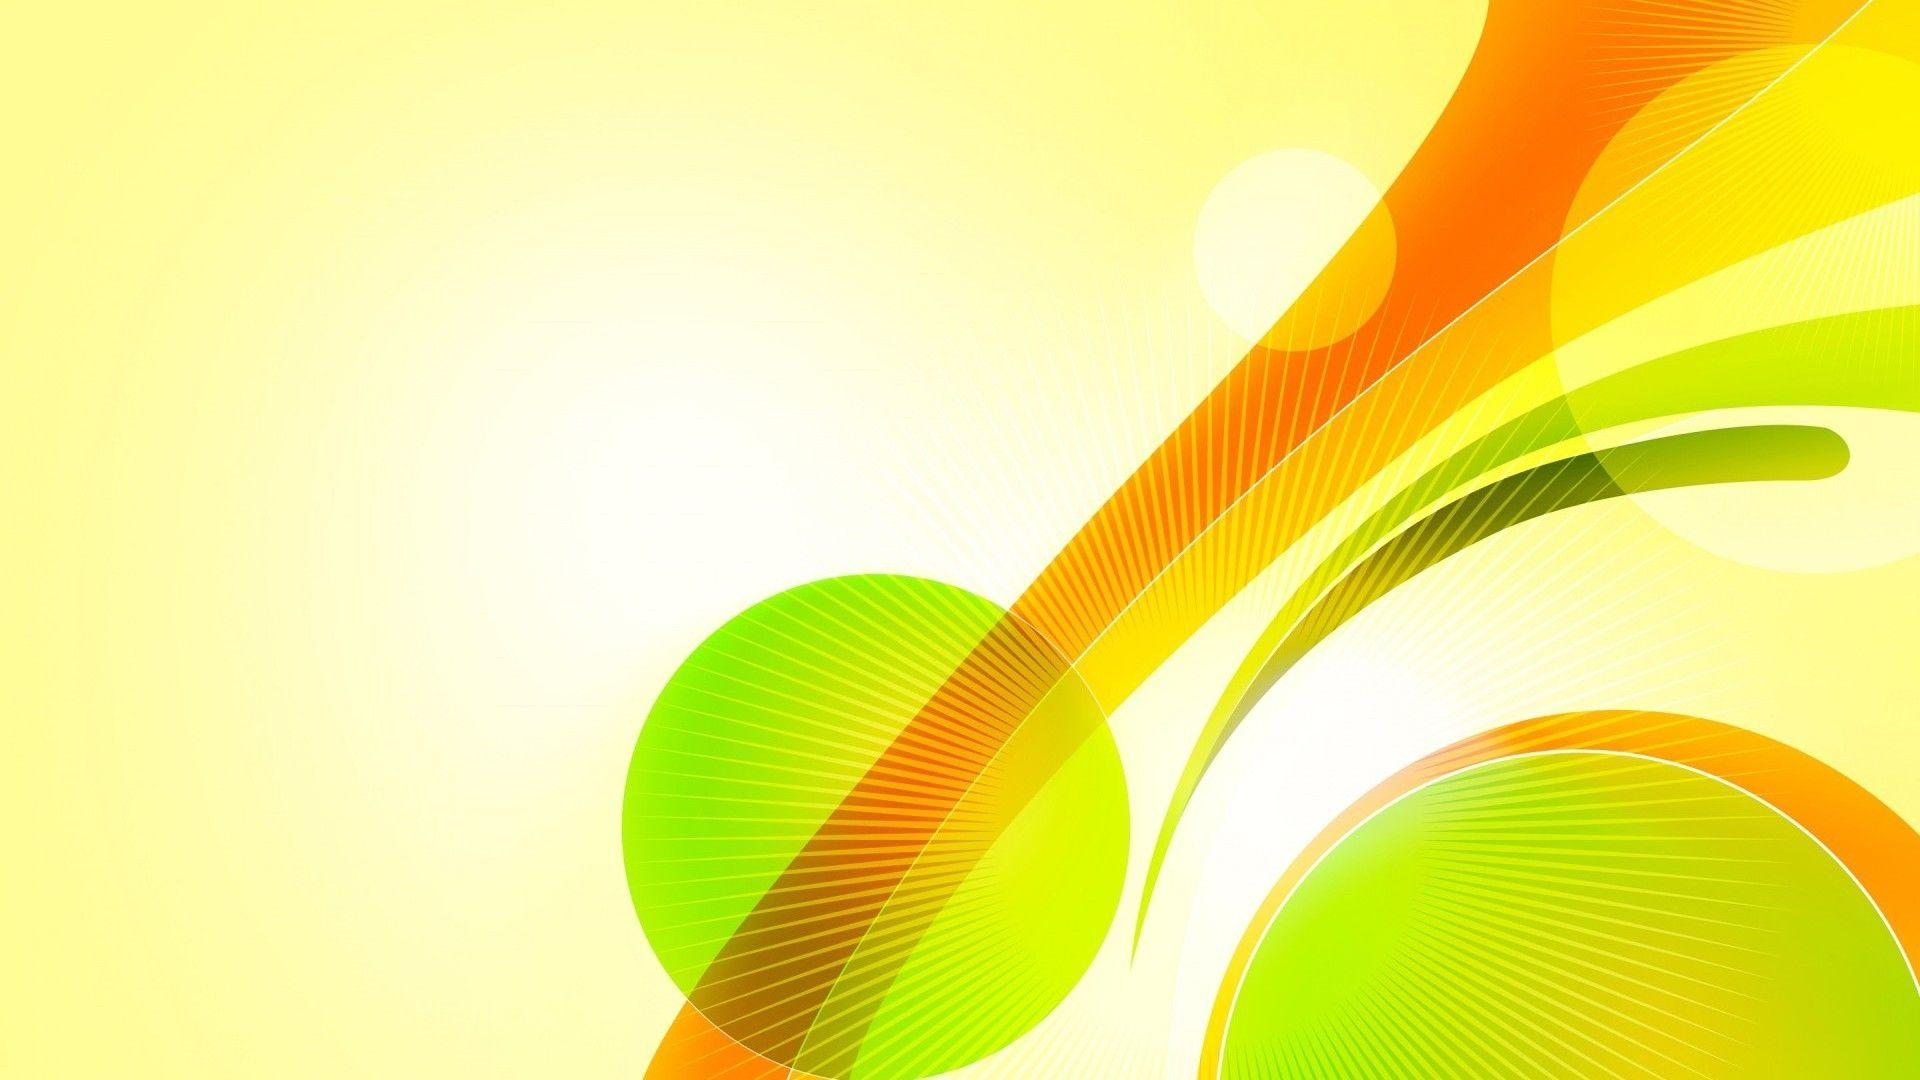 Unduh 7200 Background Hijau Tua Vektor Paling Keren